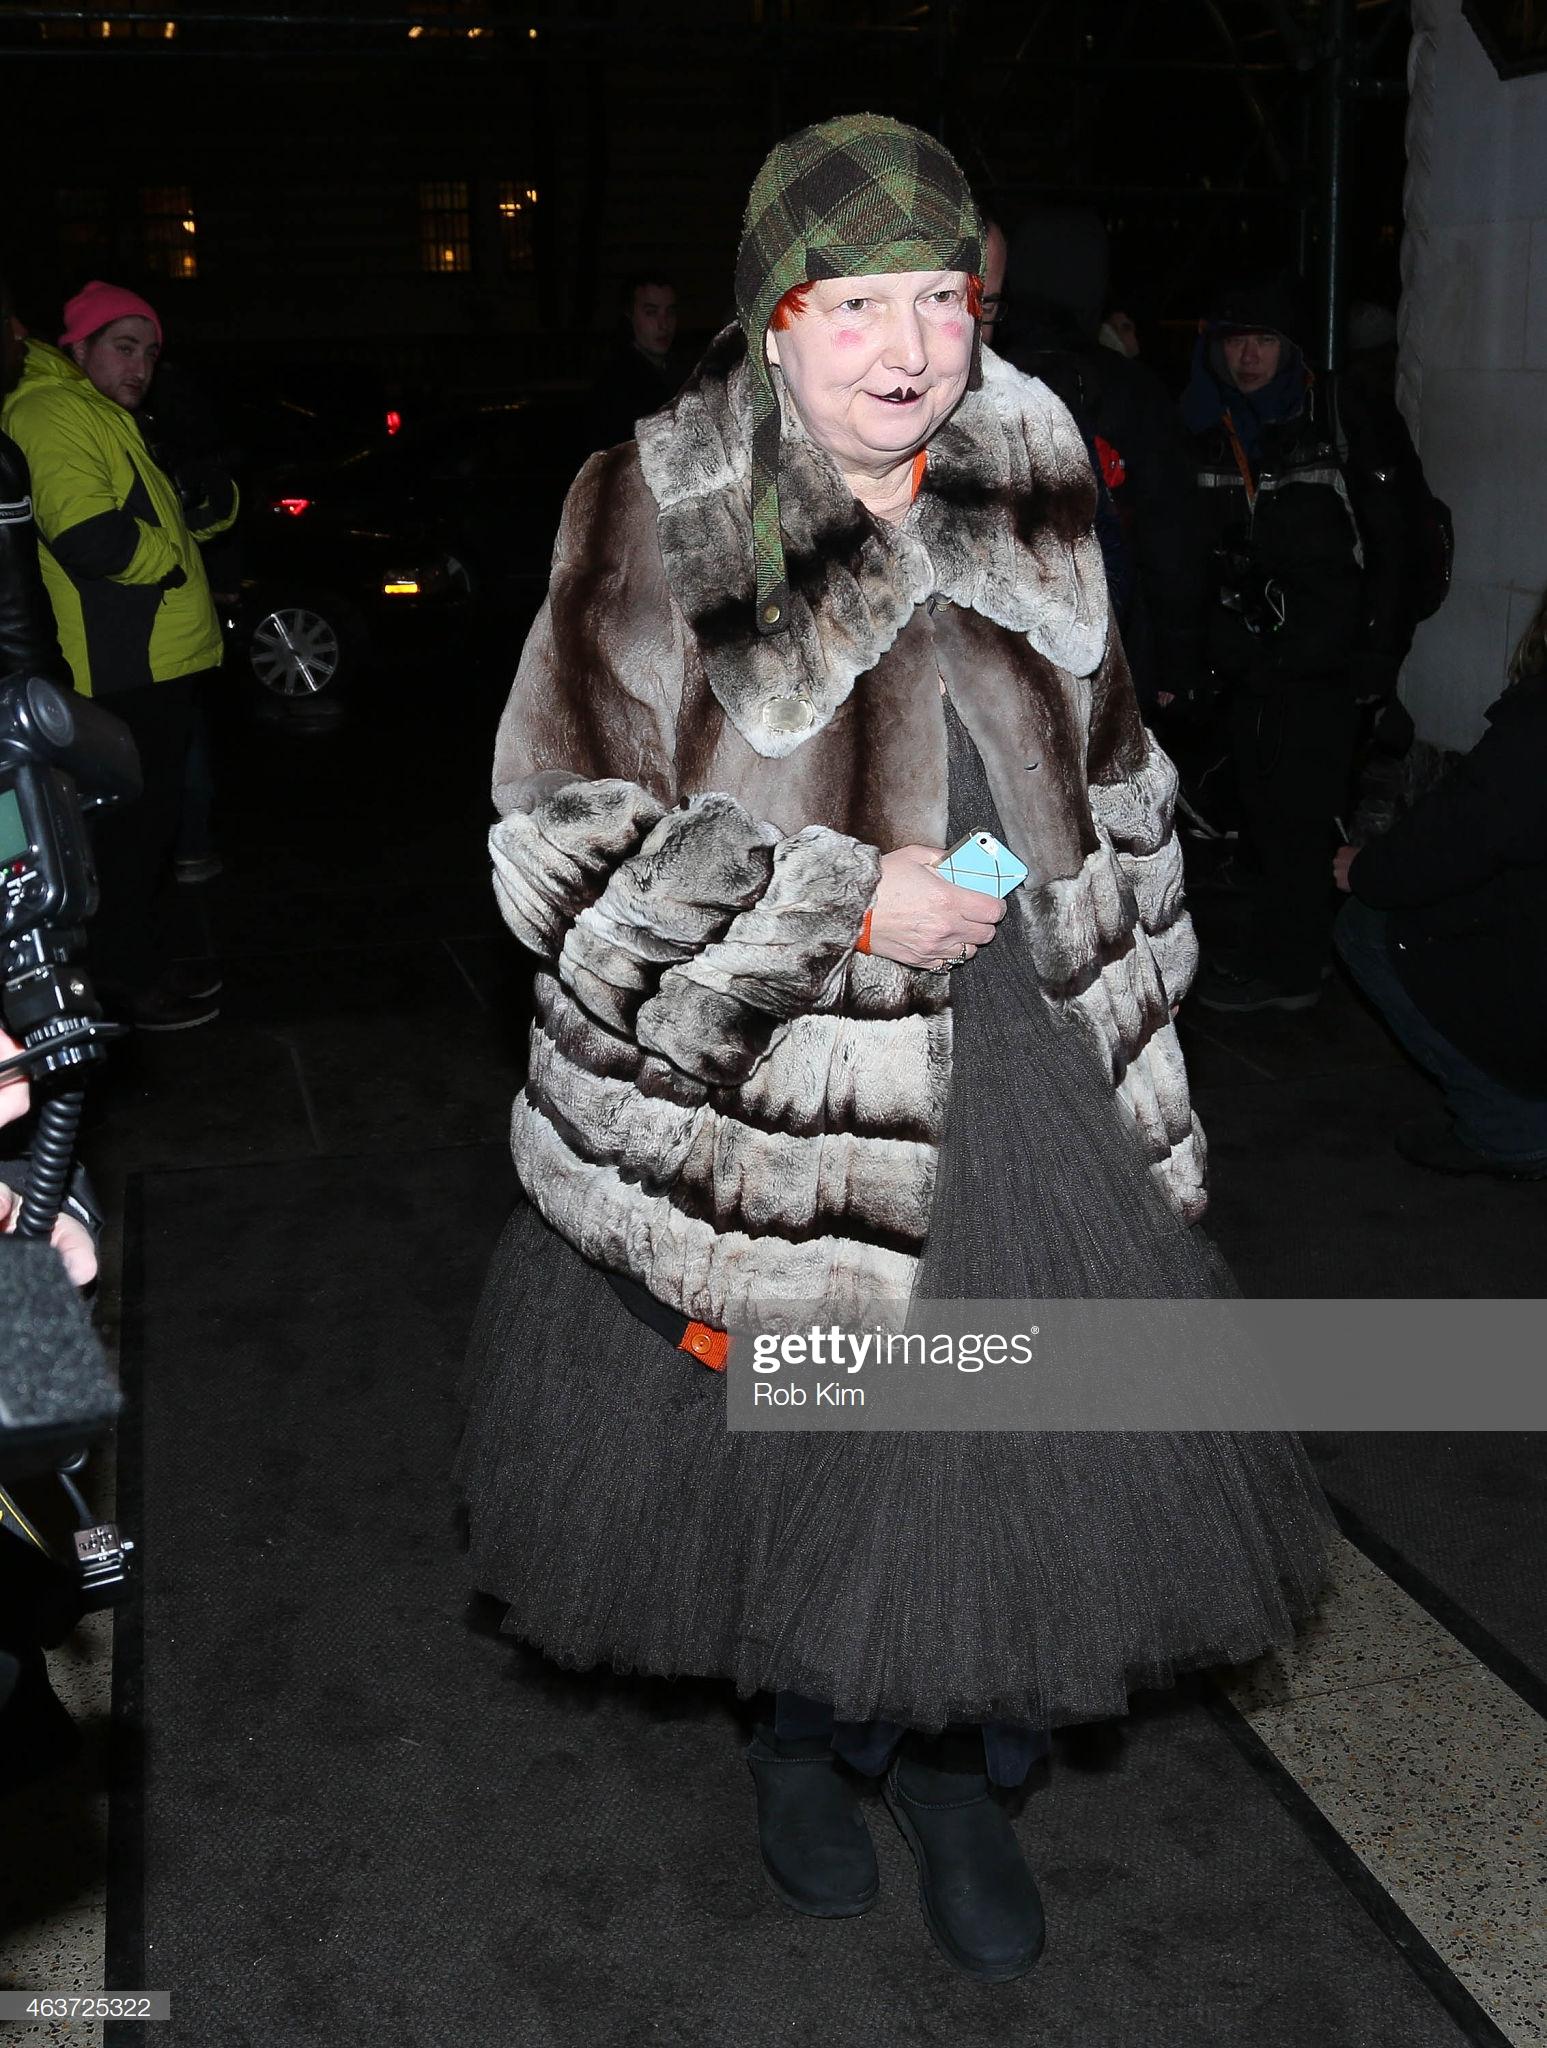 ОÑкар Де Ла Рента - За Пределами ПрибытиÑ-Mercedes-Benz Fashion Week ОÑень 2015: ÐовоÑти Фото